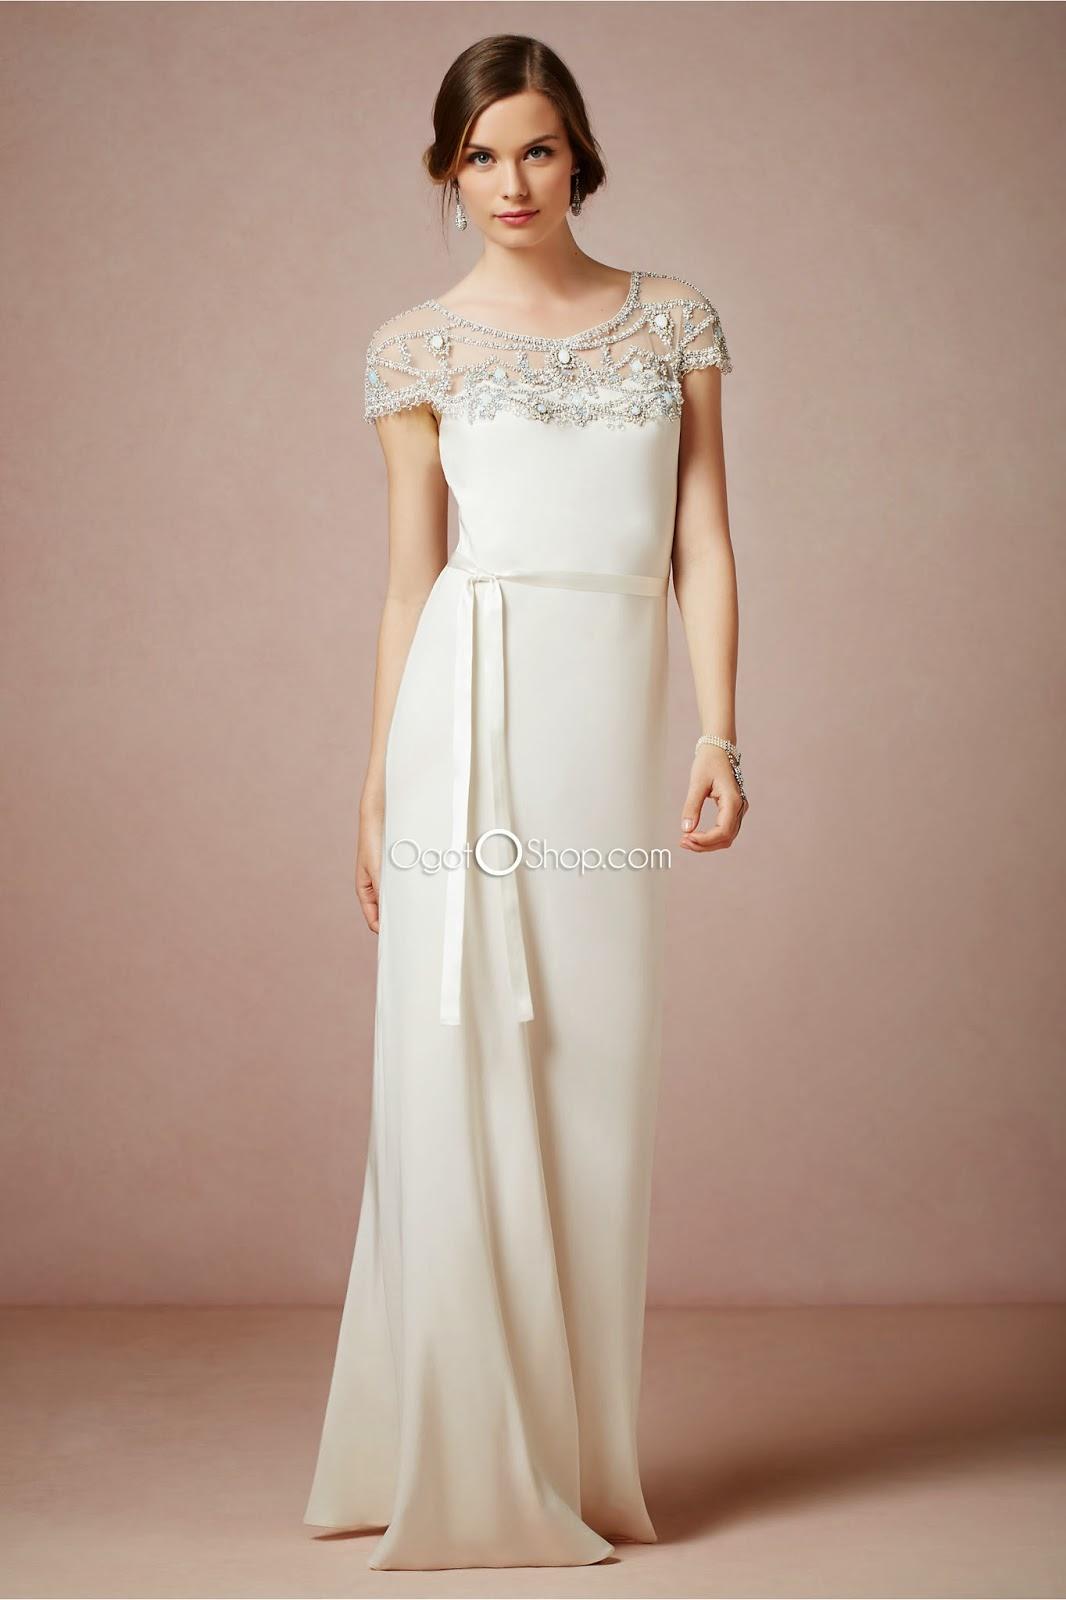 20s Wedding Dresses 8 Beautiful The Roaring us Theme